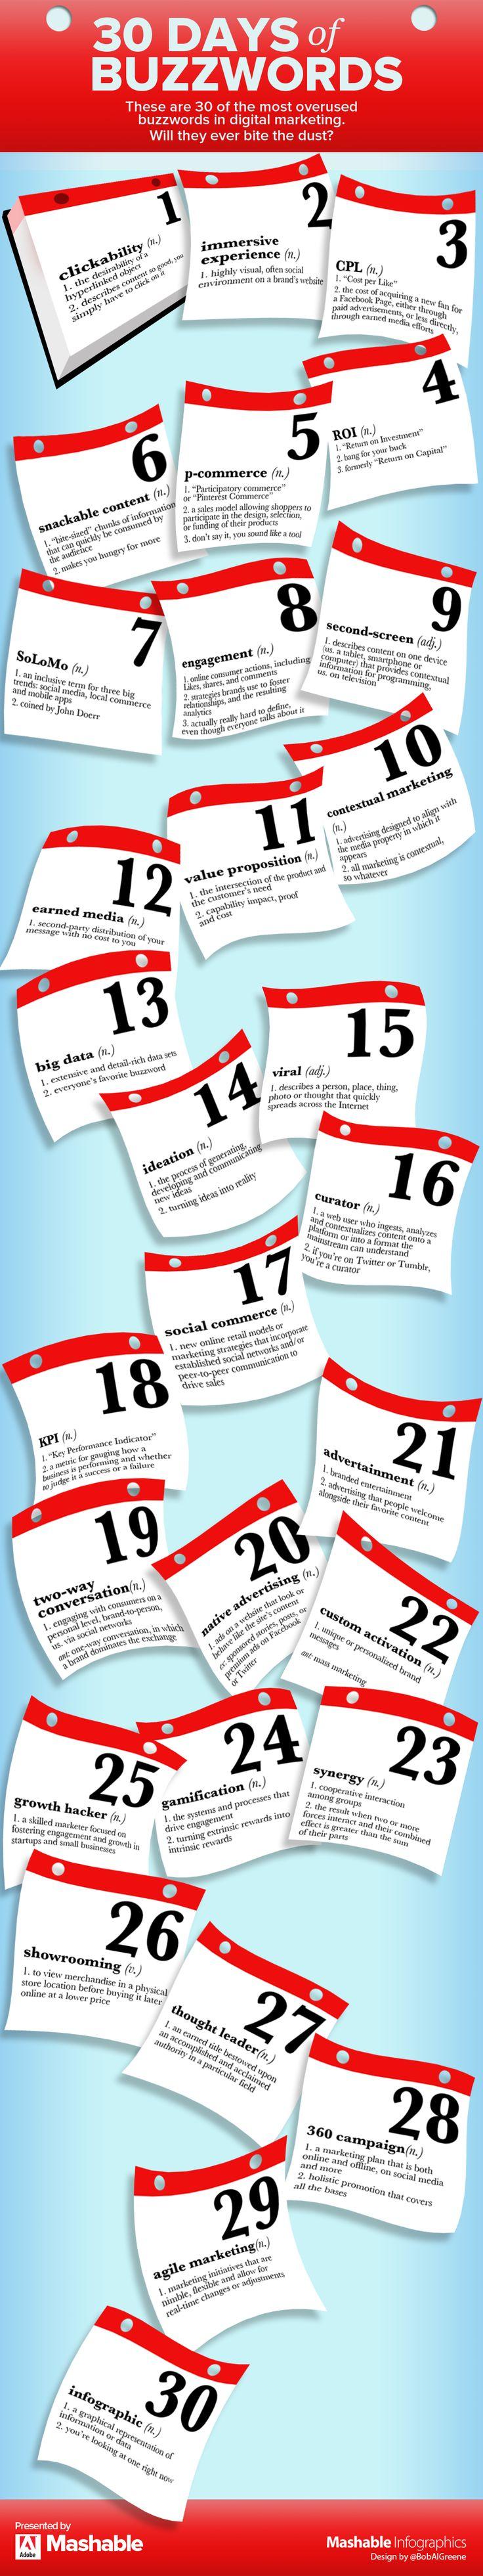 30 Overused Buzzwords in Digital Marketing from Mashable. #infographic #socialmedia #marketing